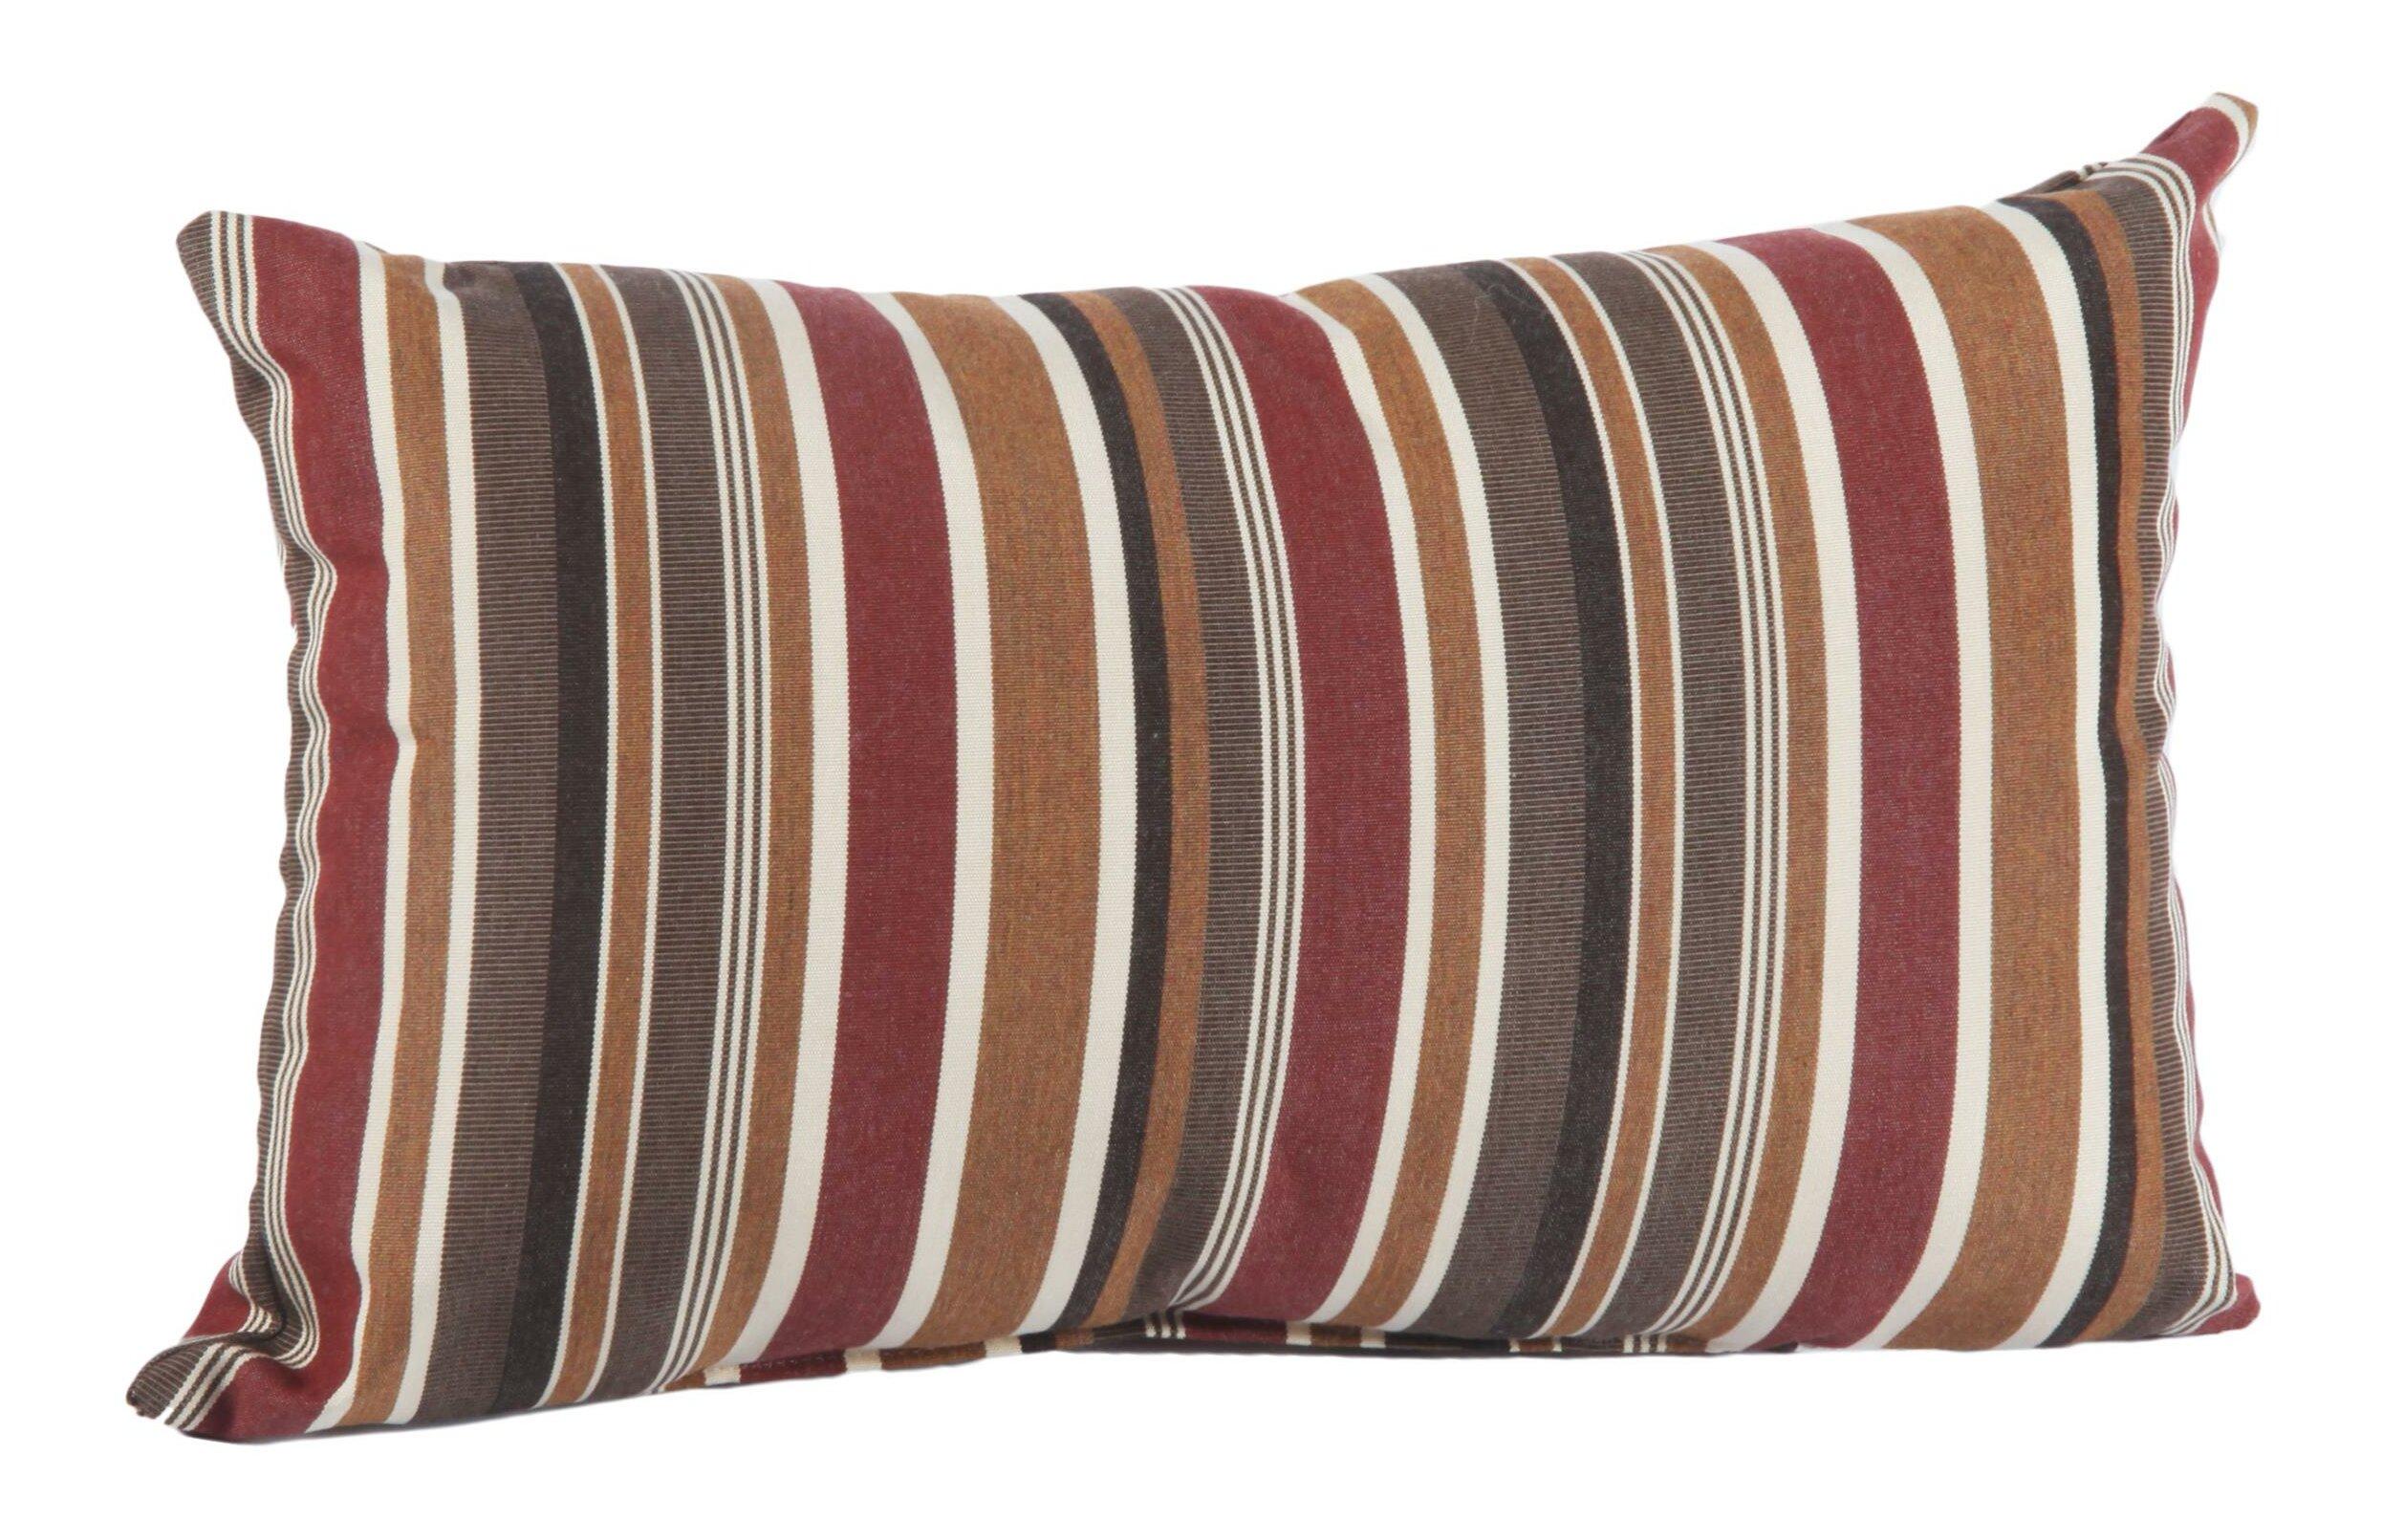 pillow reviews indoor vu pdp wayfair lumbar cashed indooroutdoor ca pillows klear decor truffle outdoor